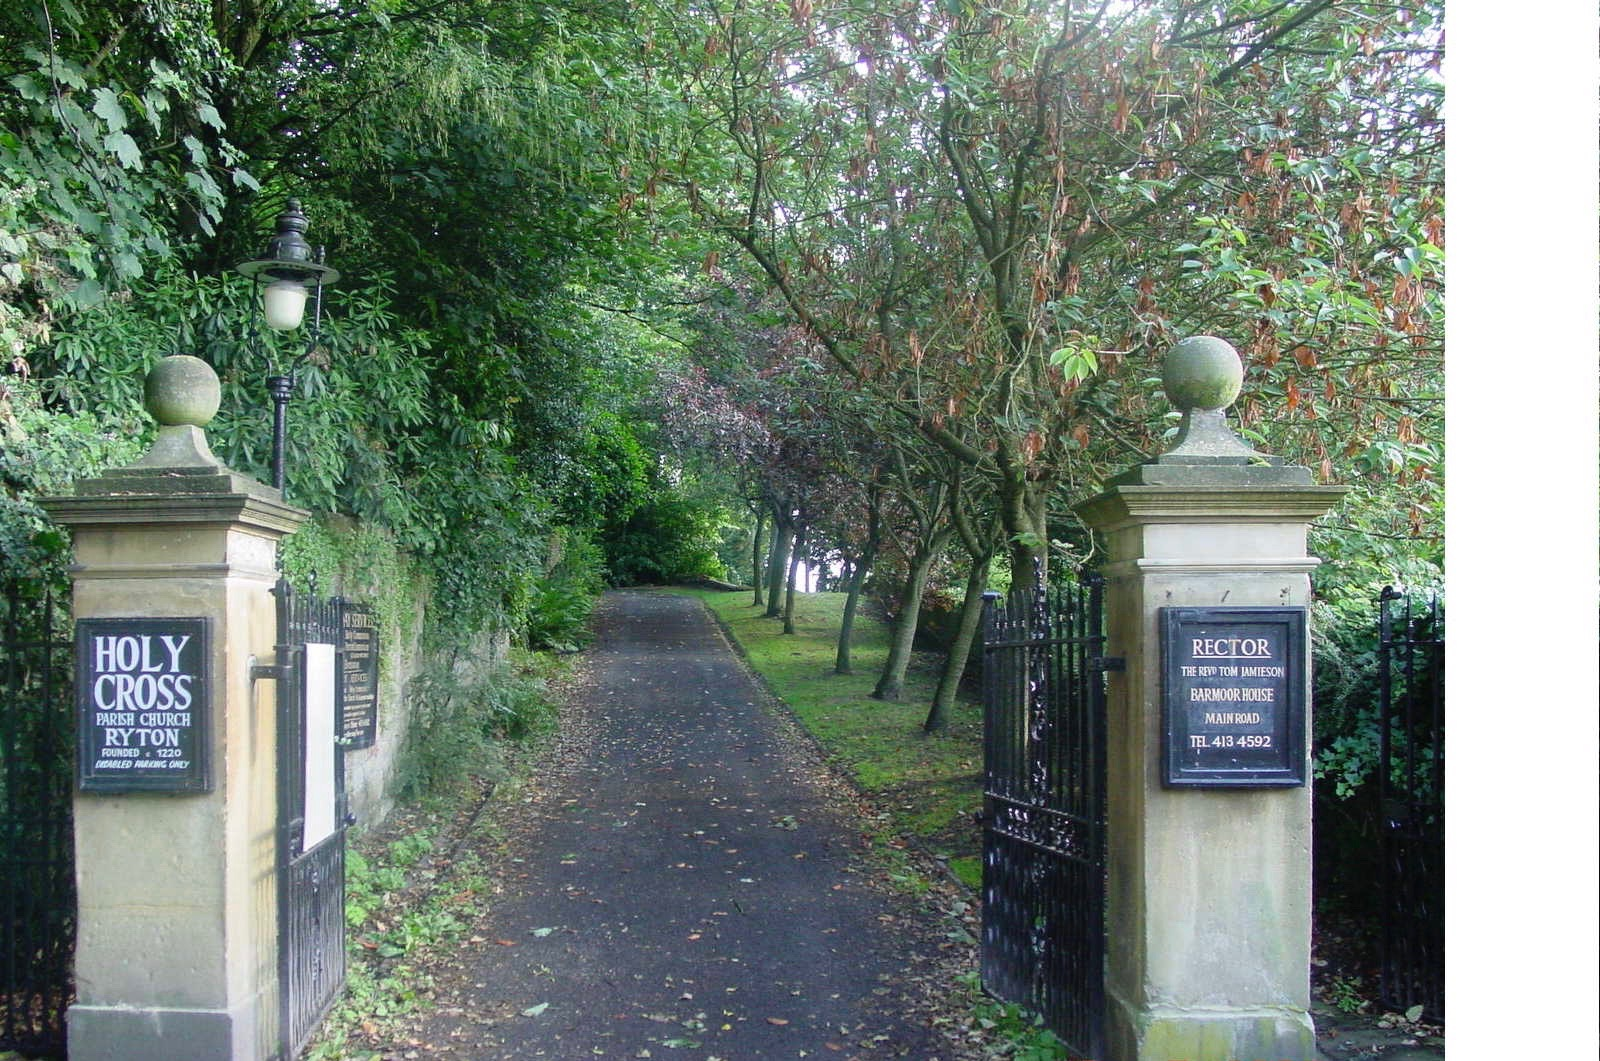 Entrance Holy Cross church, Ryton